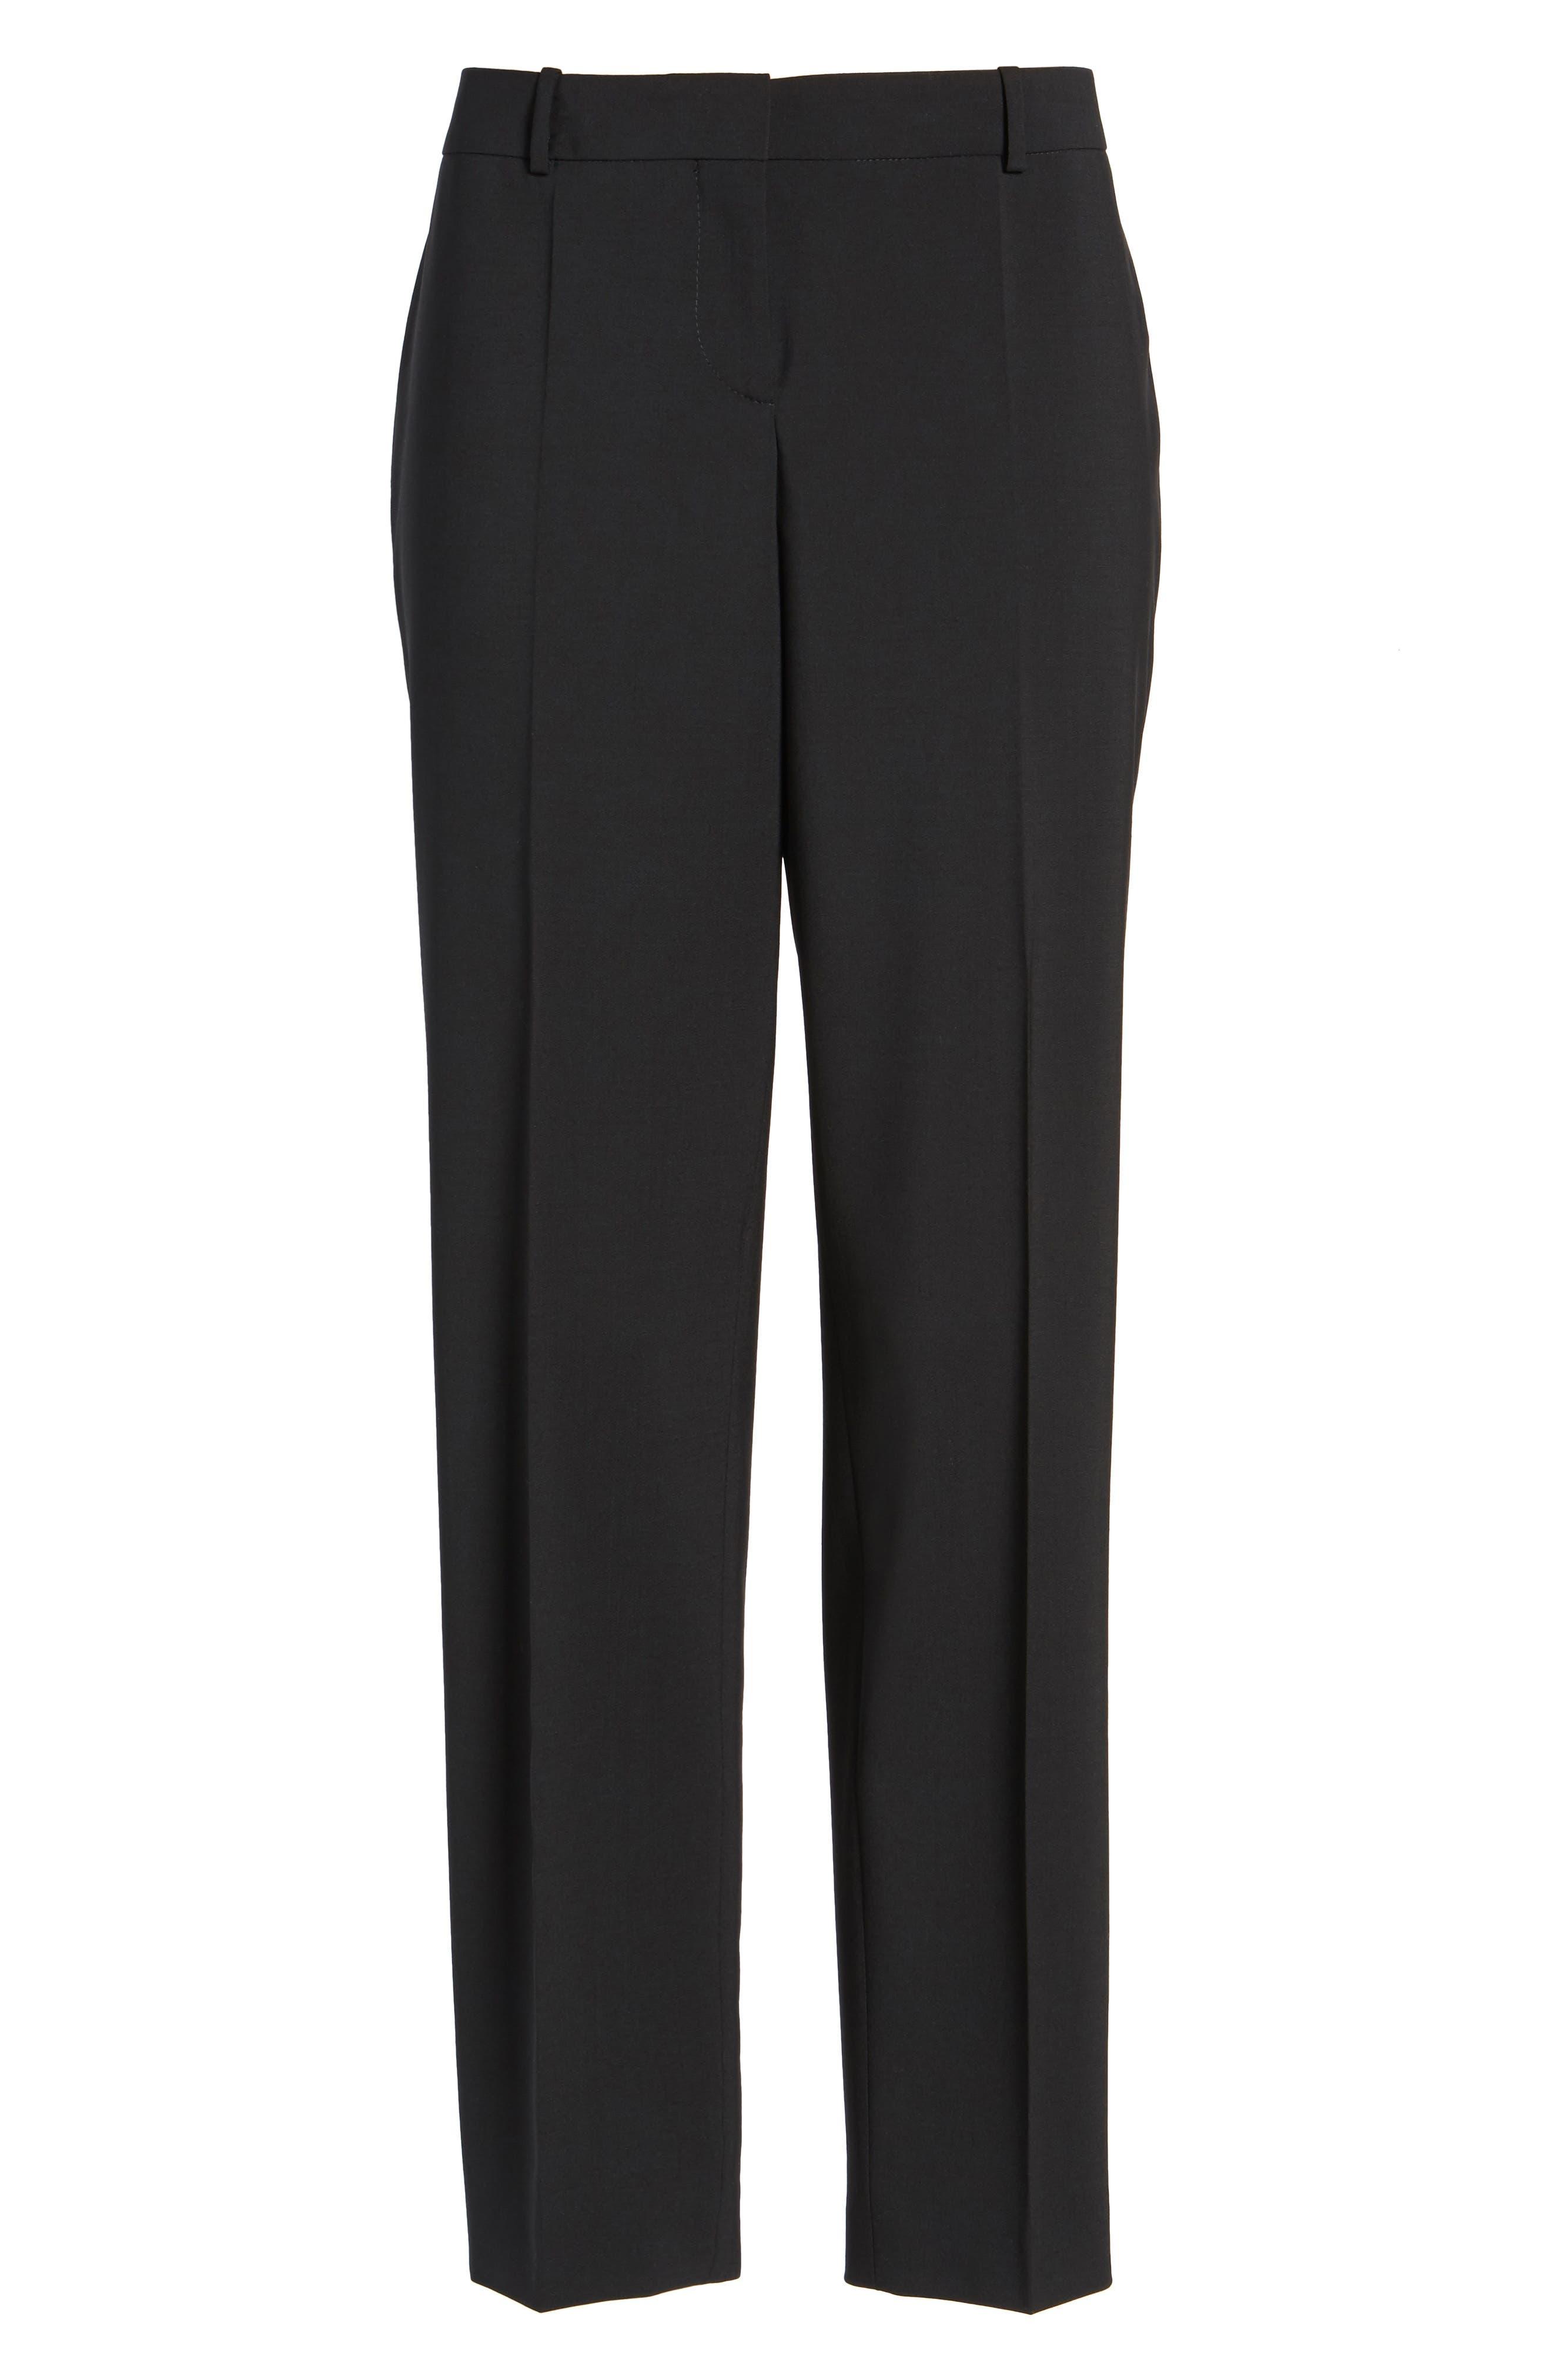 Tiluna Tropical Stretch Wool Ankle Trousers,                             Alternate thumbnail 2, color,                             BLACK